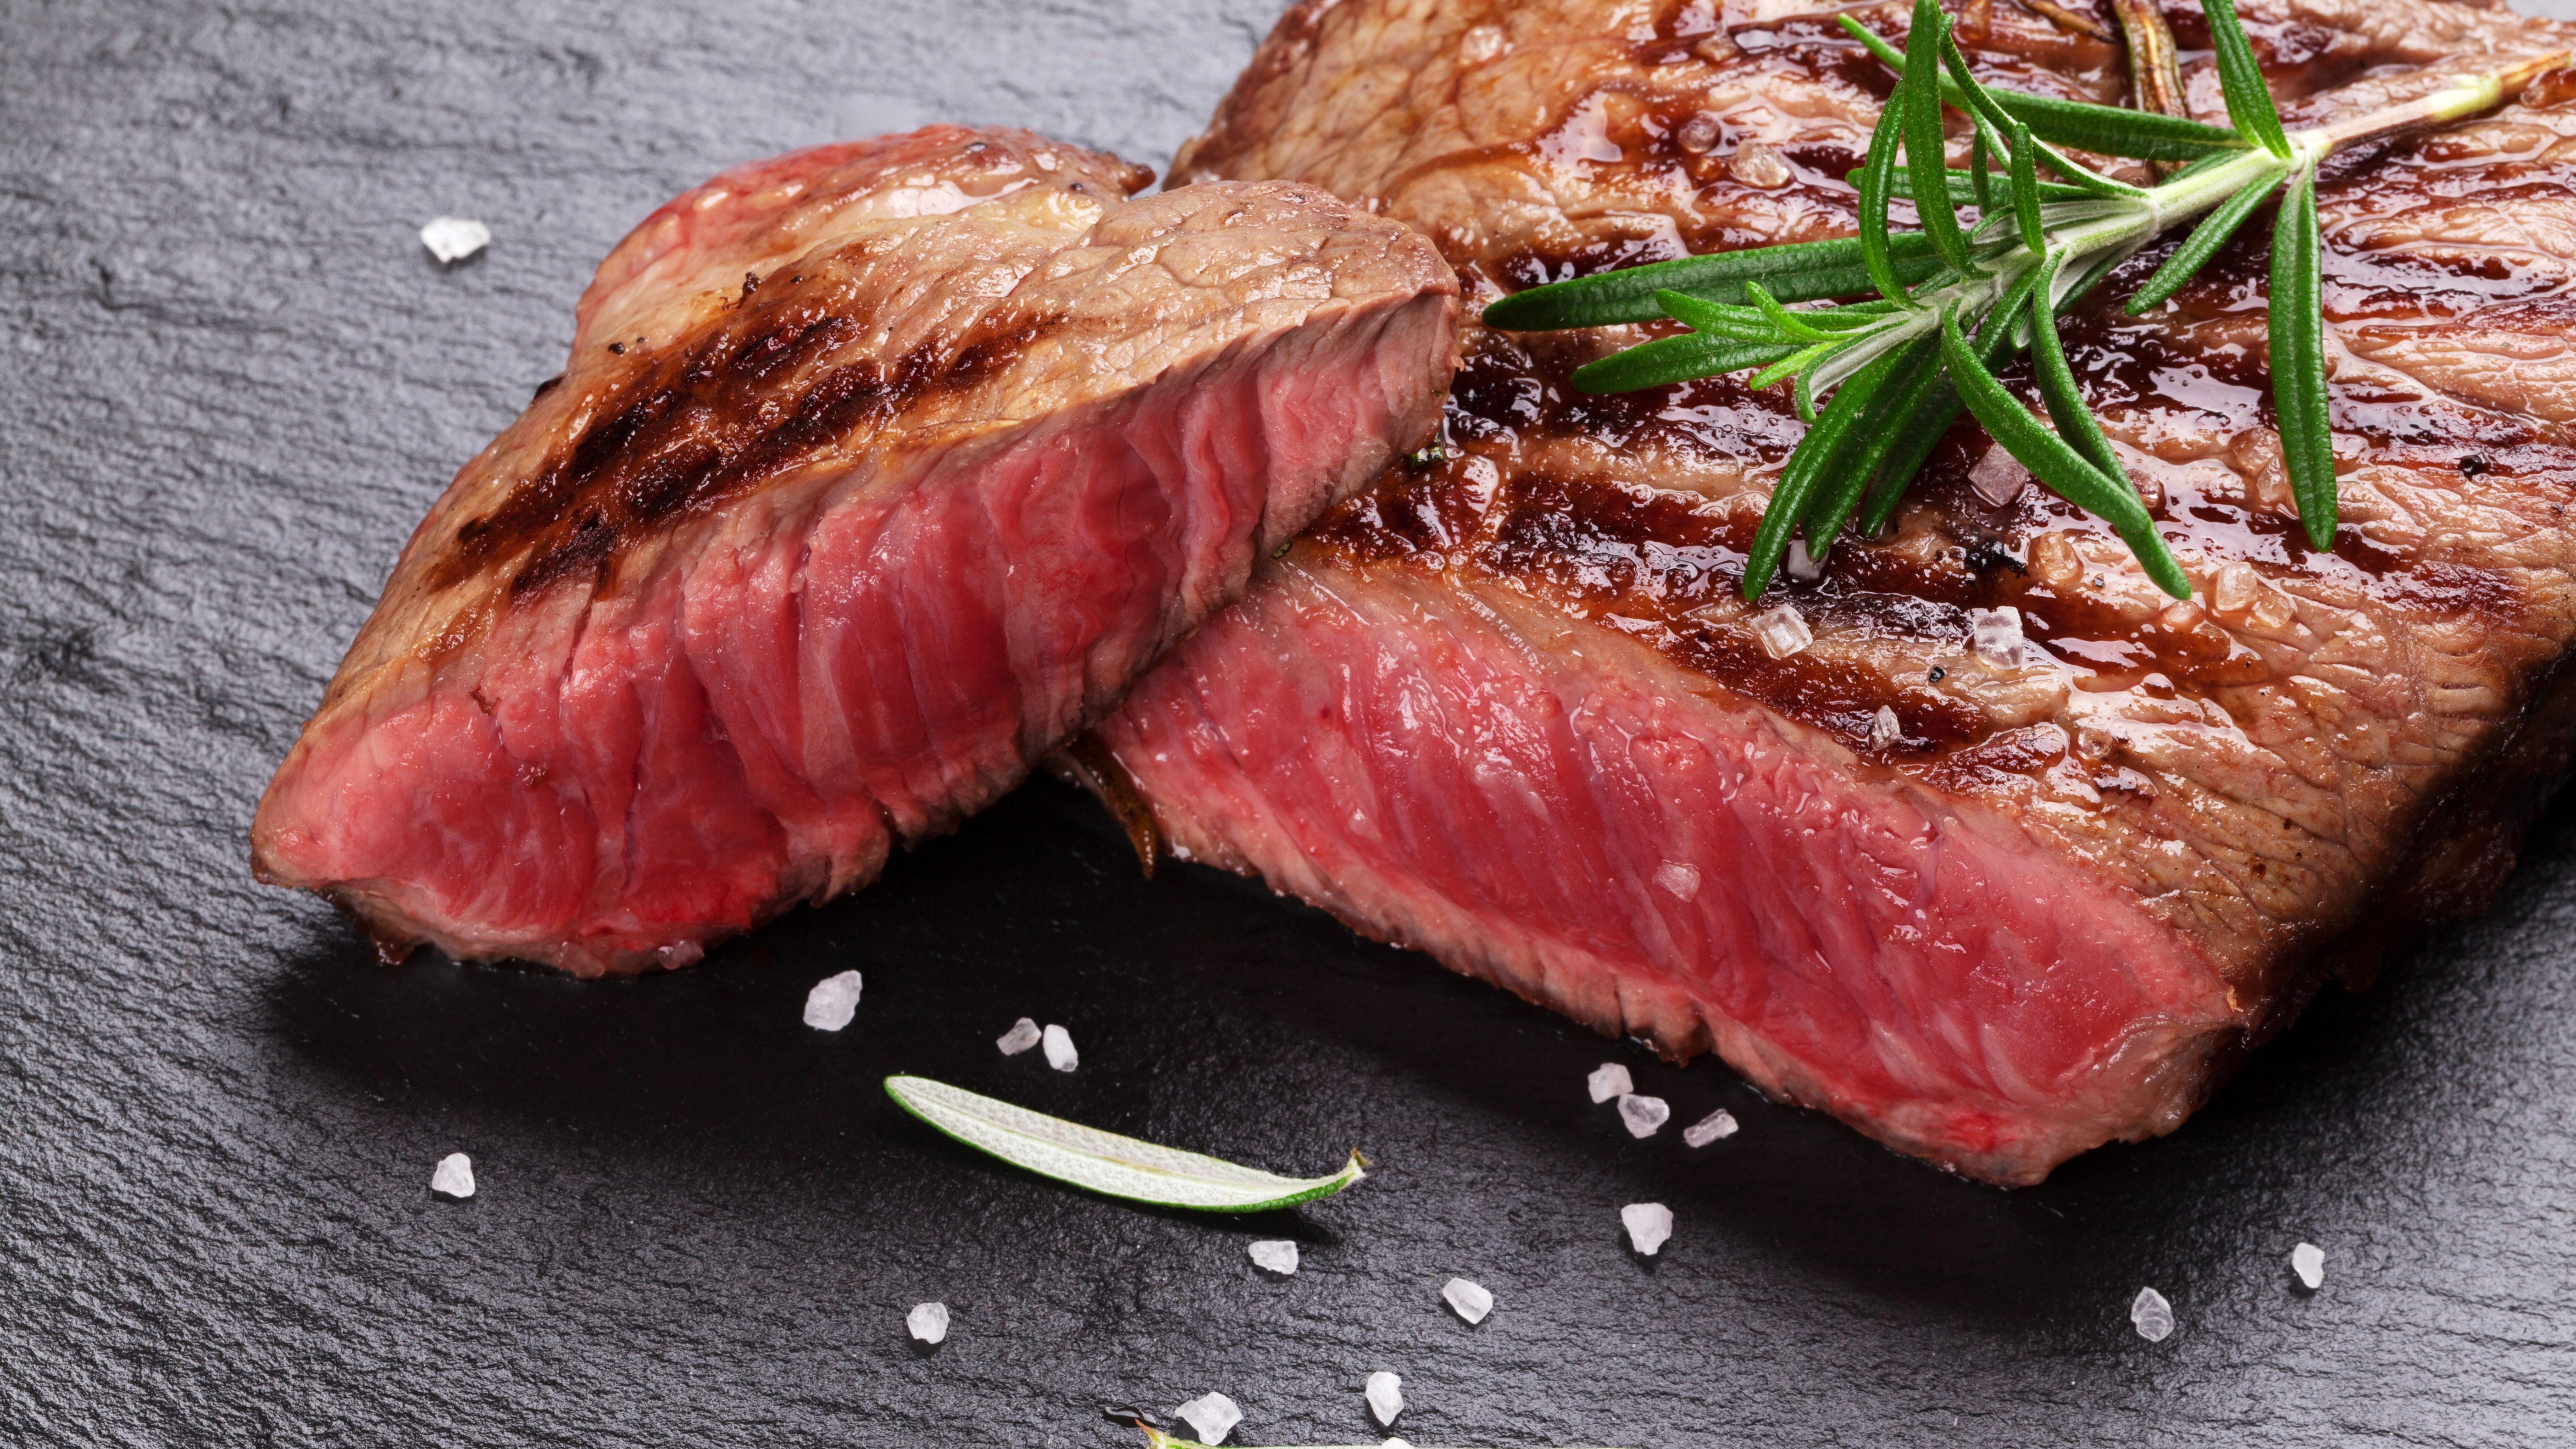 Grilled Top Sirloin Steak